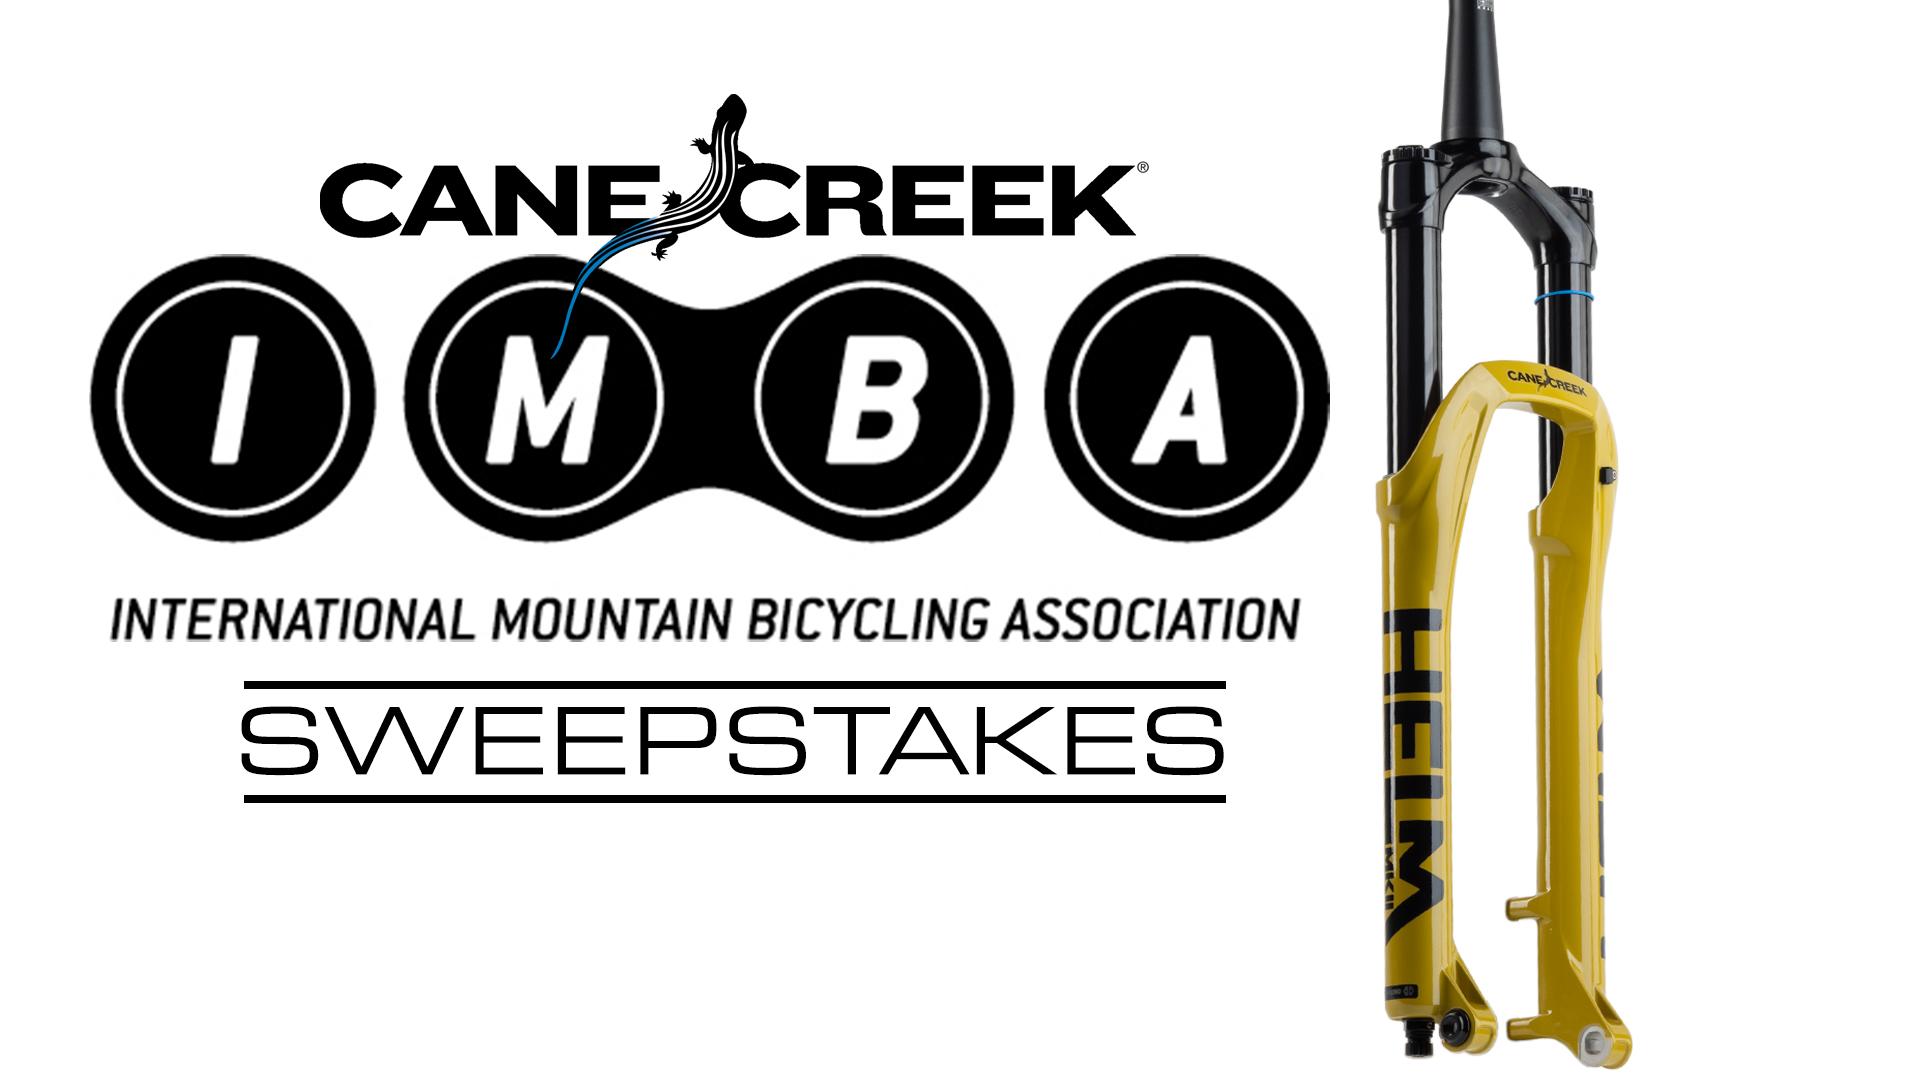 Cane Creek IMBA Raffle - Mustard Helm MKII, Cane Creek IMBA Raffle – Mustard Helm MKII